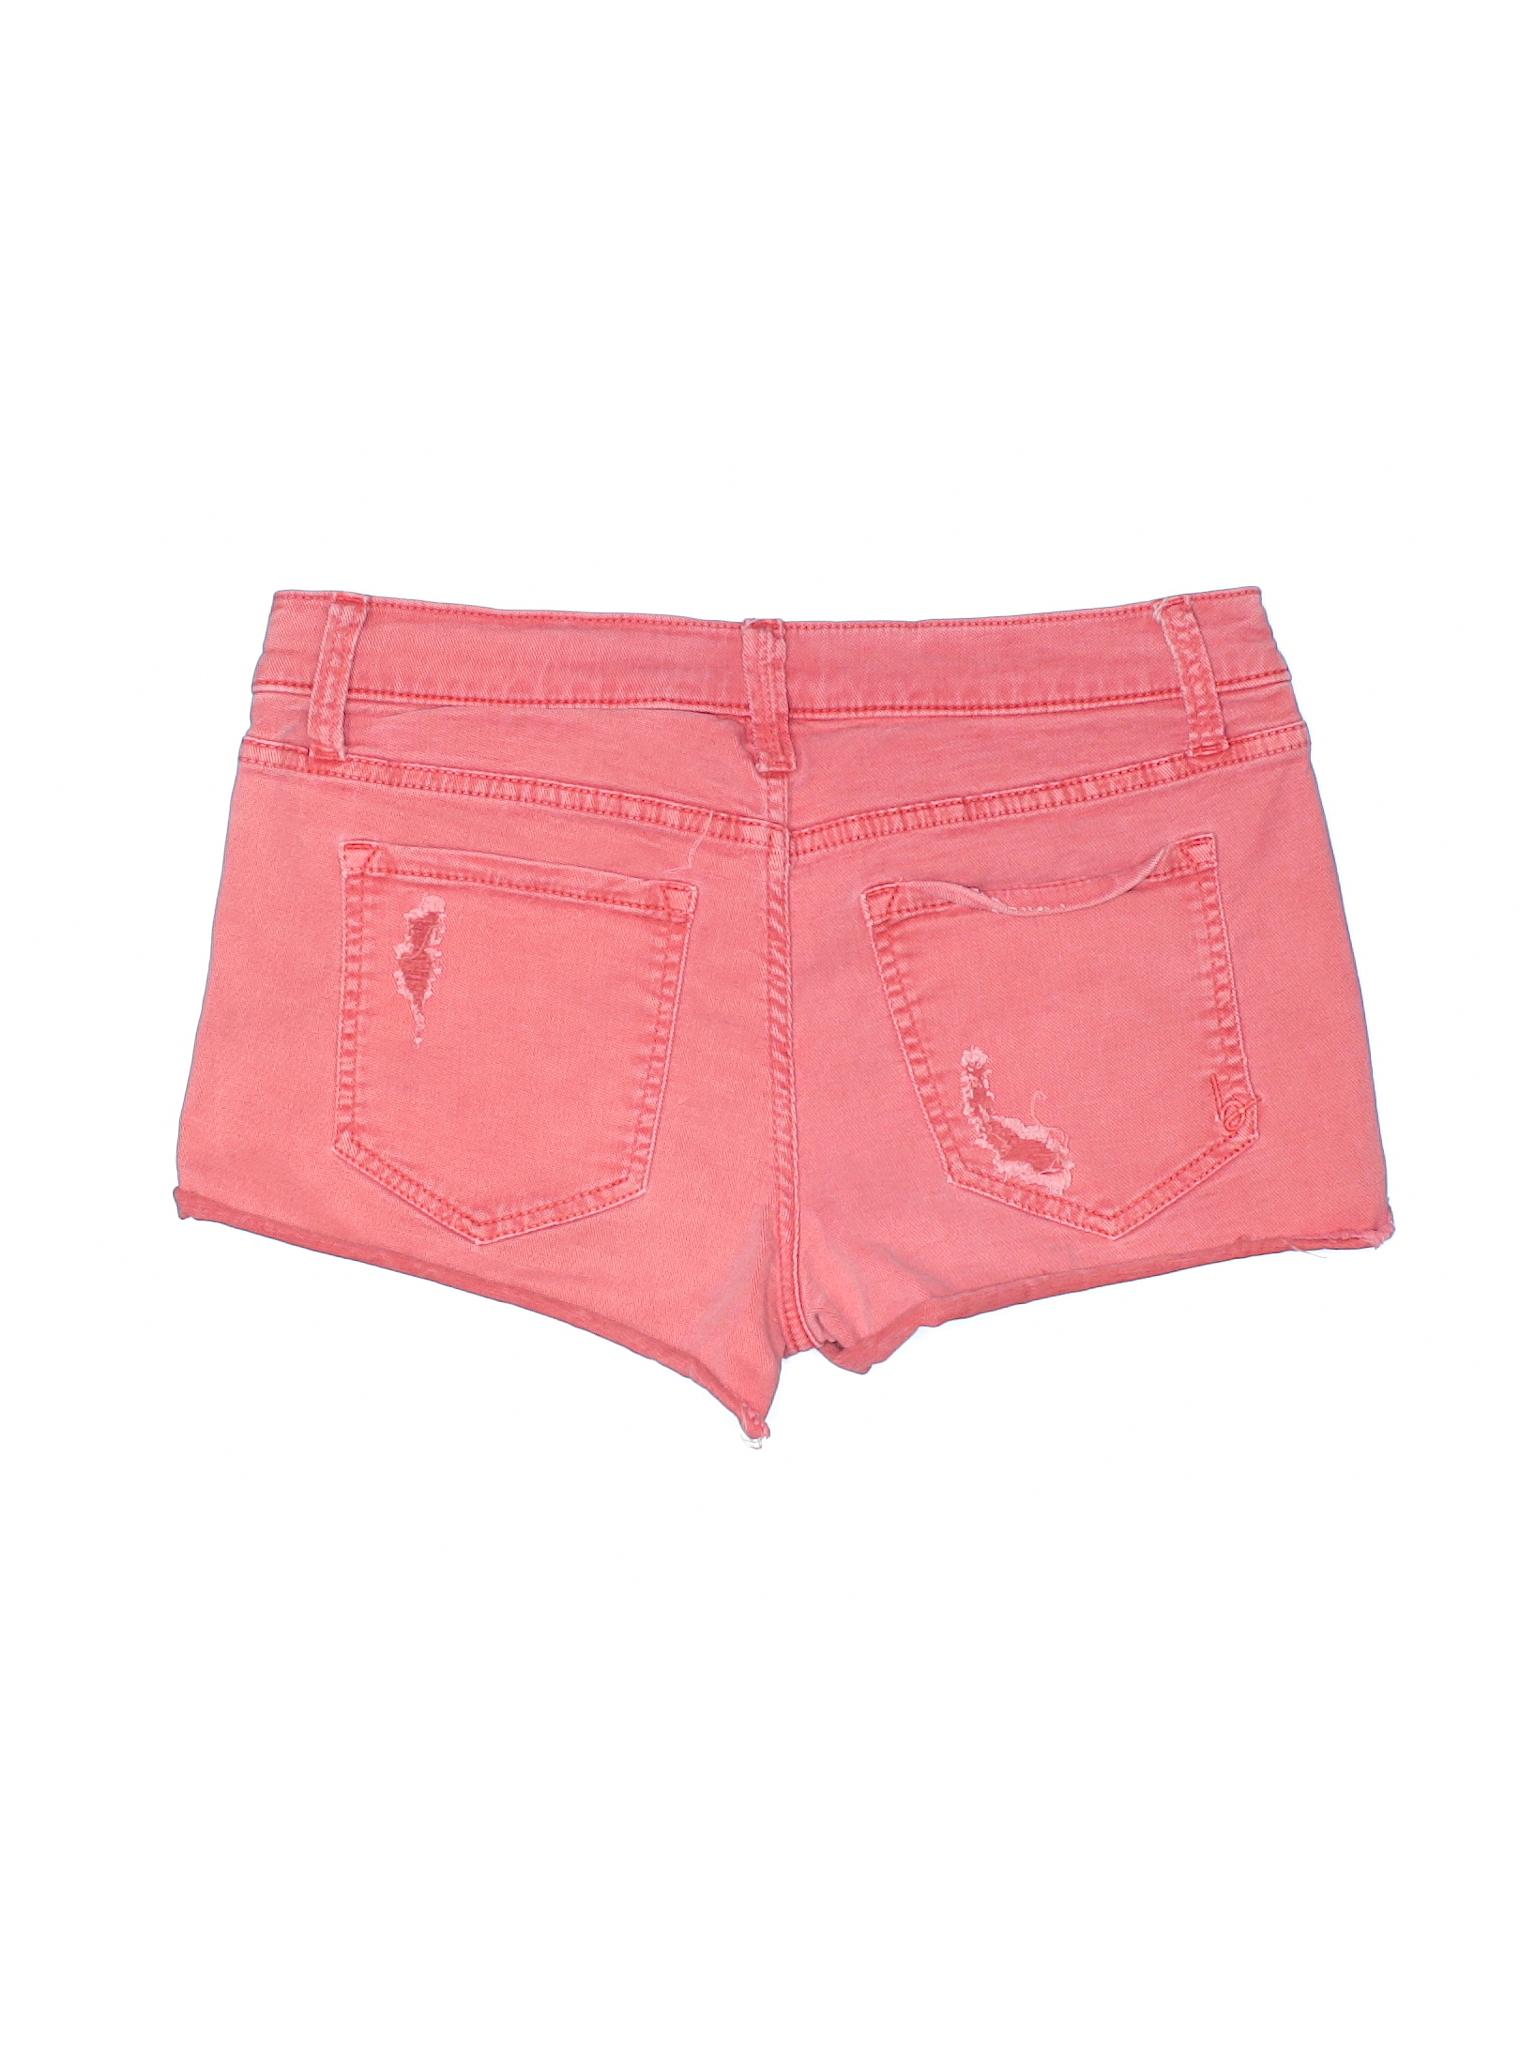 Boutique Bebe Denim Denim Shorts Denim Denim Bebe Boutique Shorts Shorts Boutique Boutique Bebe Bebe IqwBSS